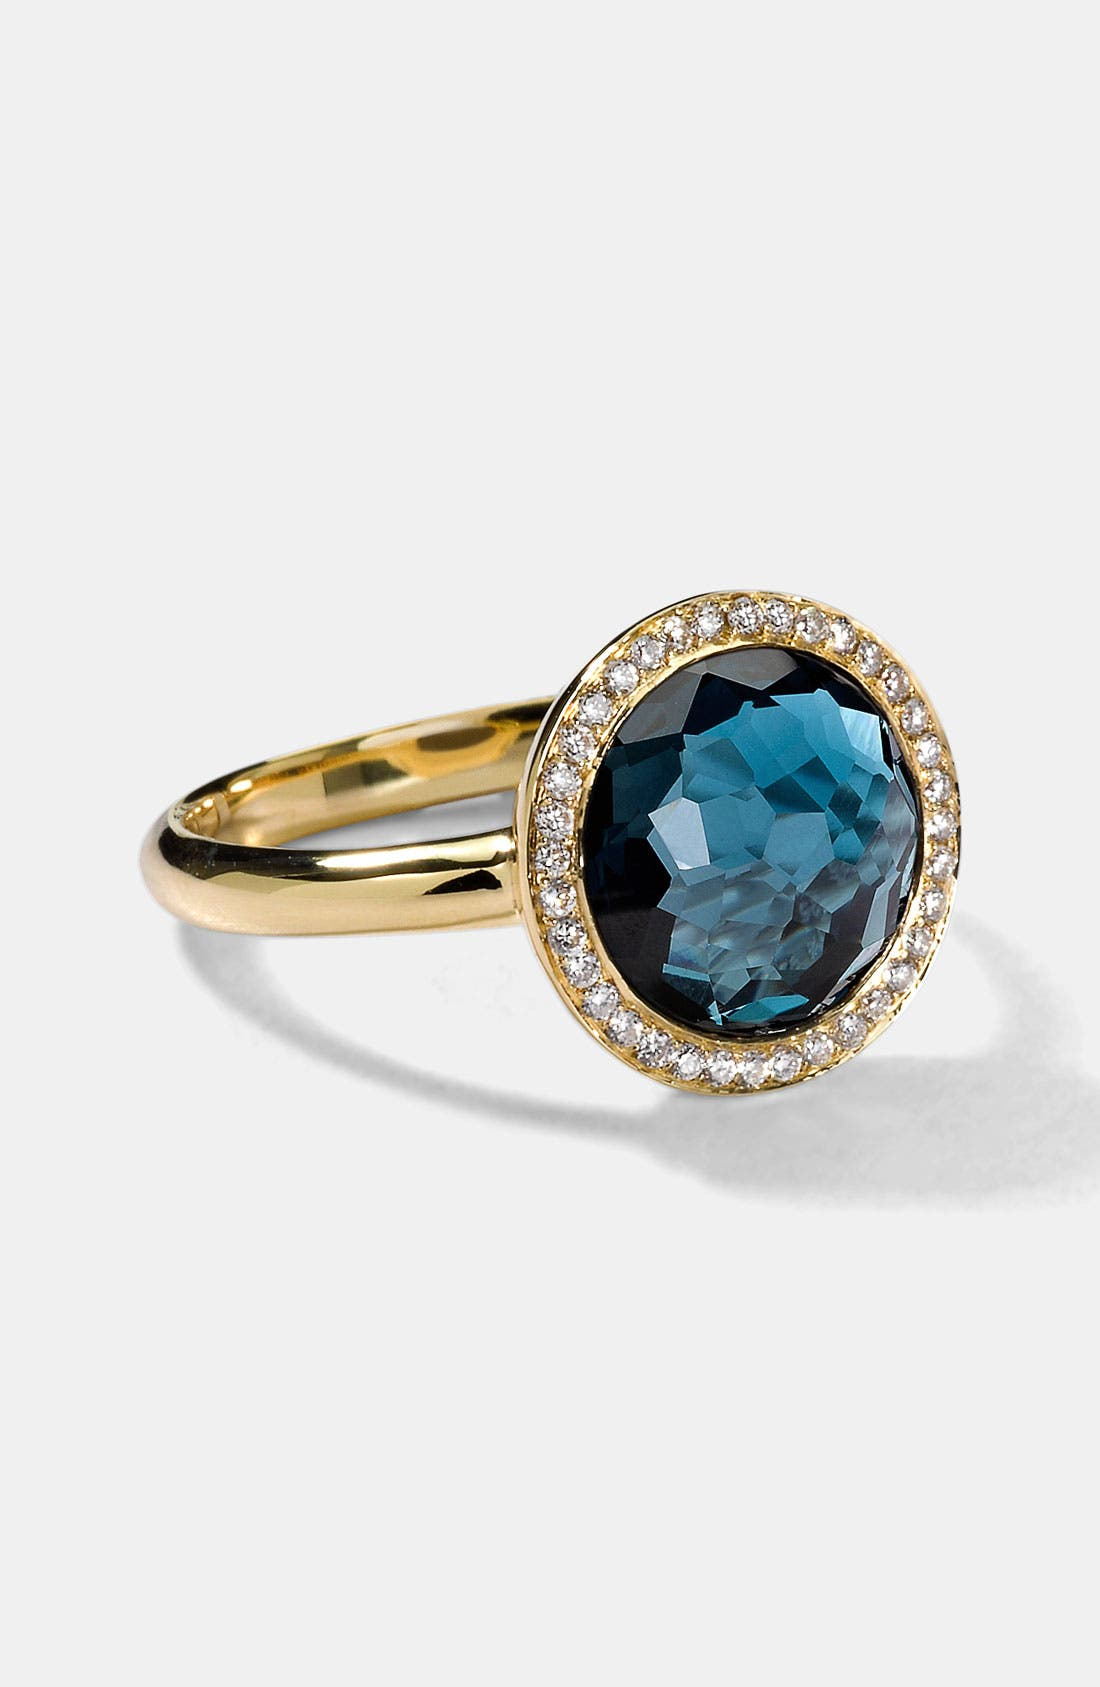 Alternate Image 1 Selected - Ippolita 'Rock Candy - Lollitini' 18k Gold Ring